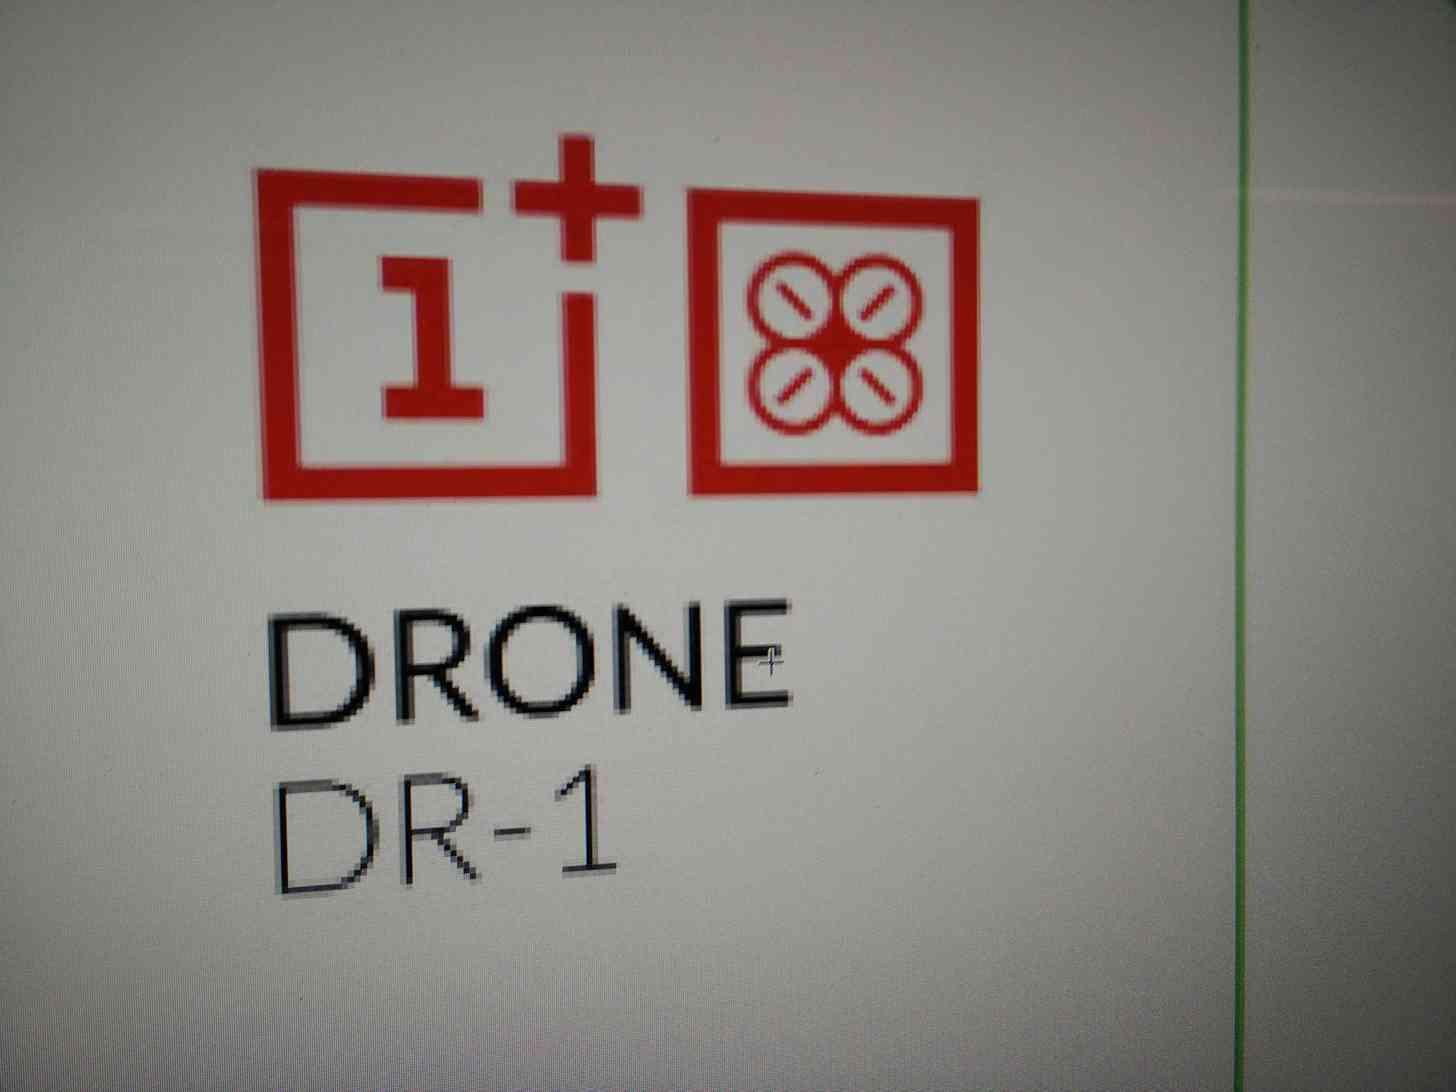 OnePlus DR-1 drone logo